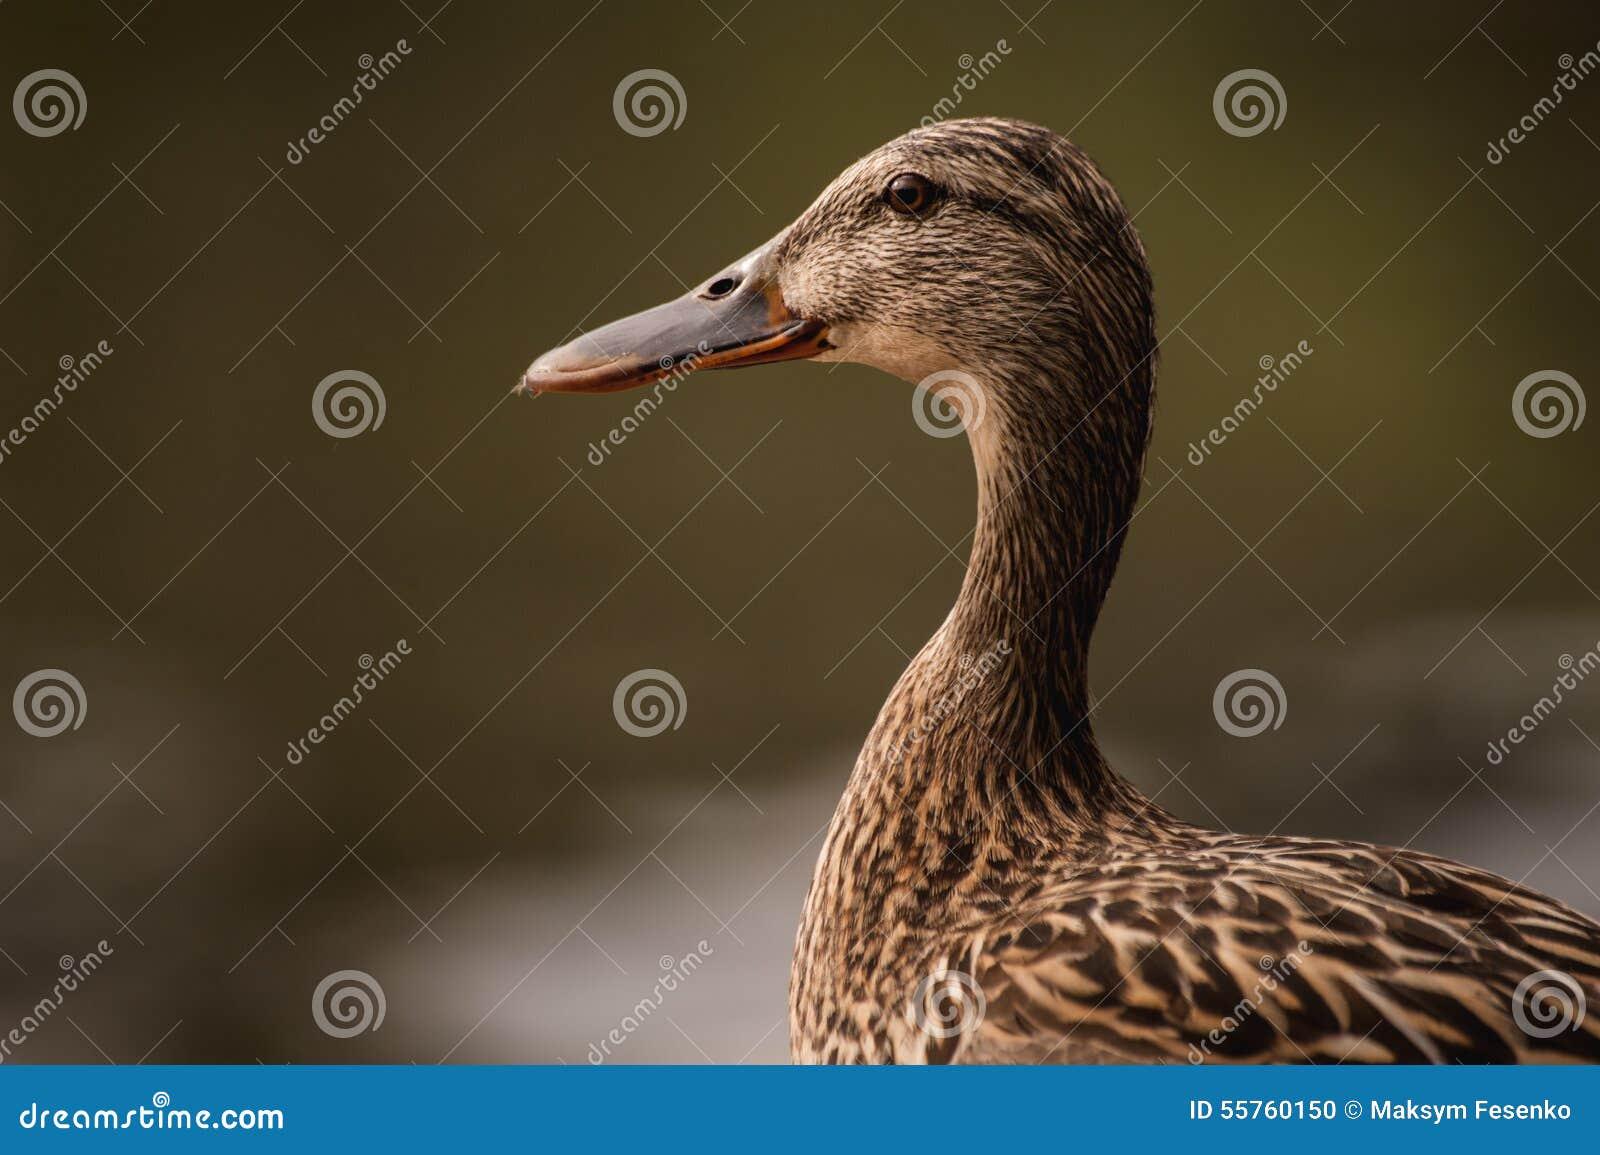 Female duck portrait on blurred background